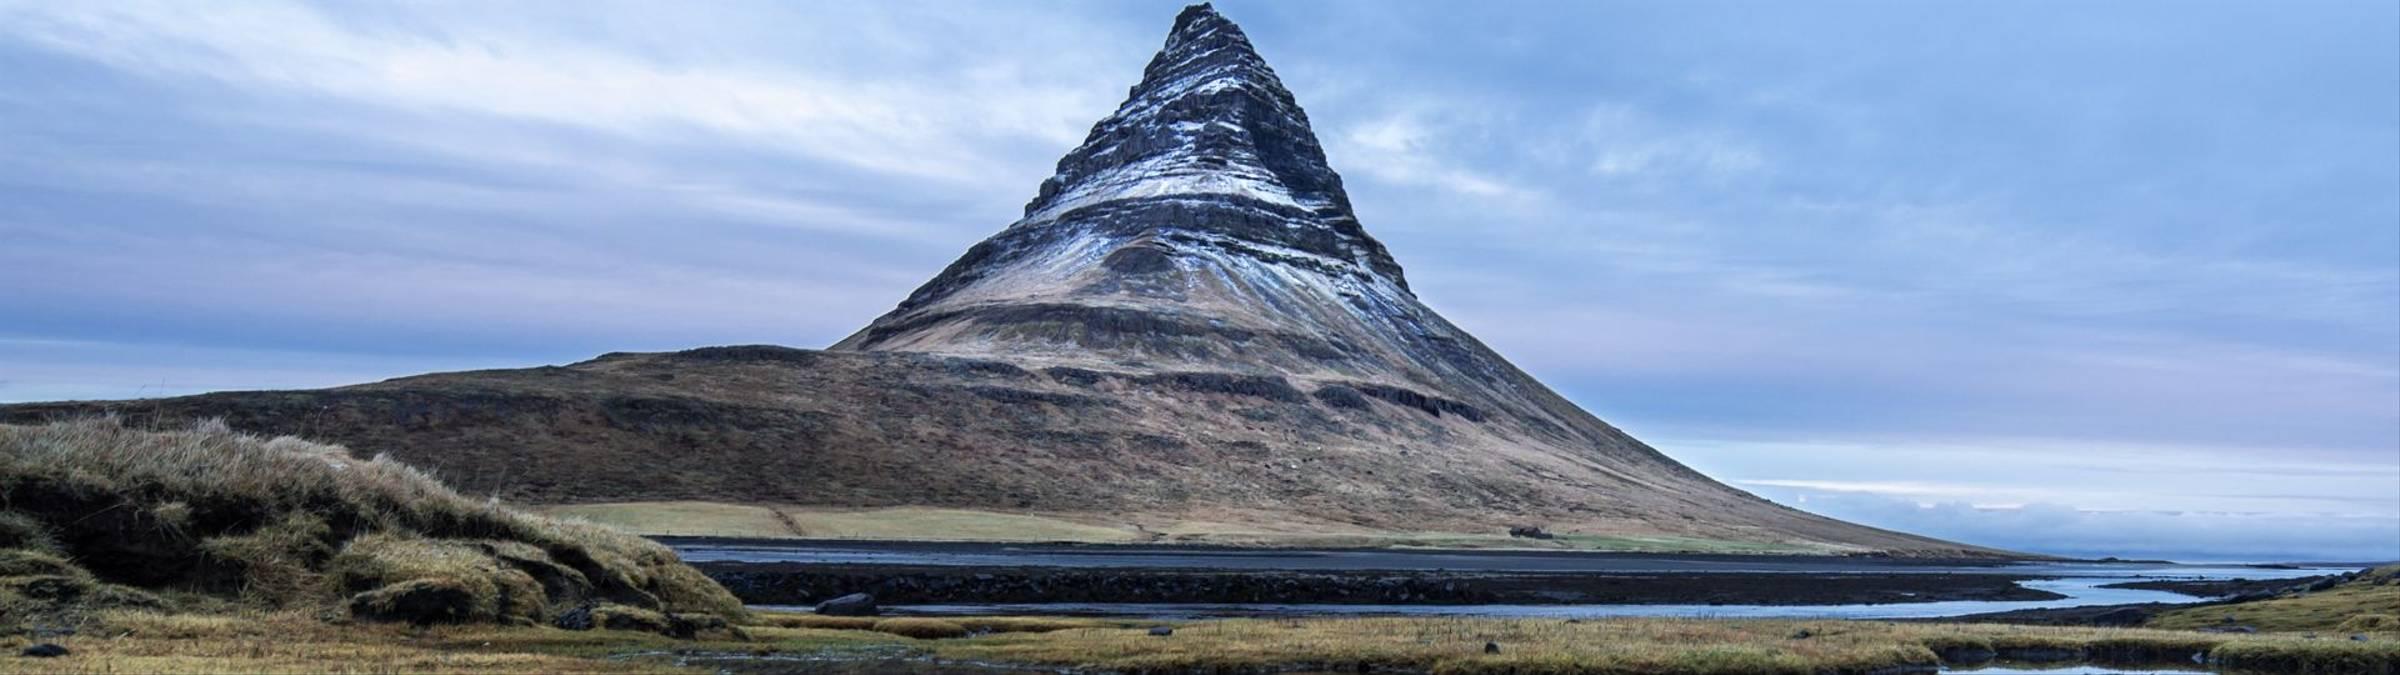 Iceland_Pro_Travel-9.jpg